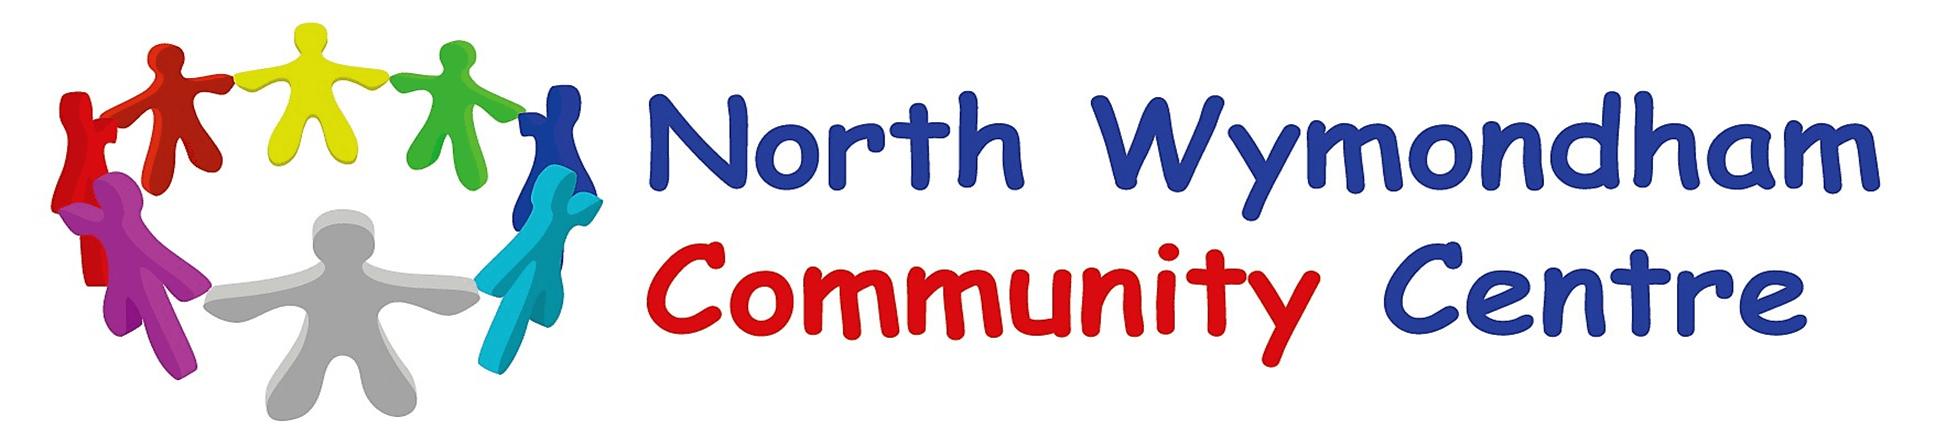 North Wymondham Community Centre Association